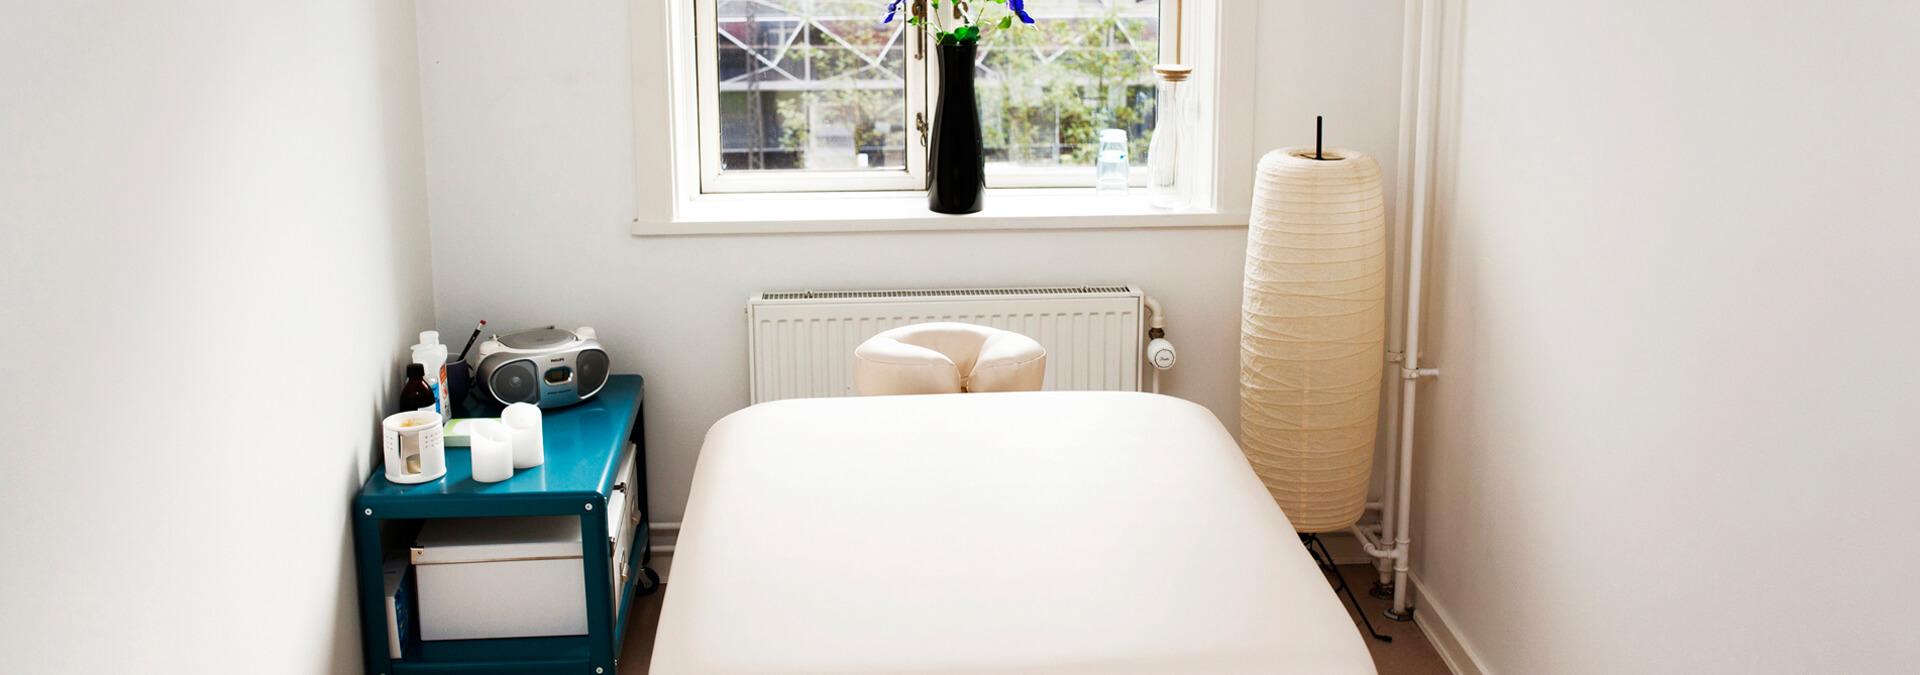 Hvid massagebriks med lys, musik og blomster på krisecenter